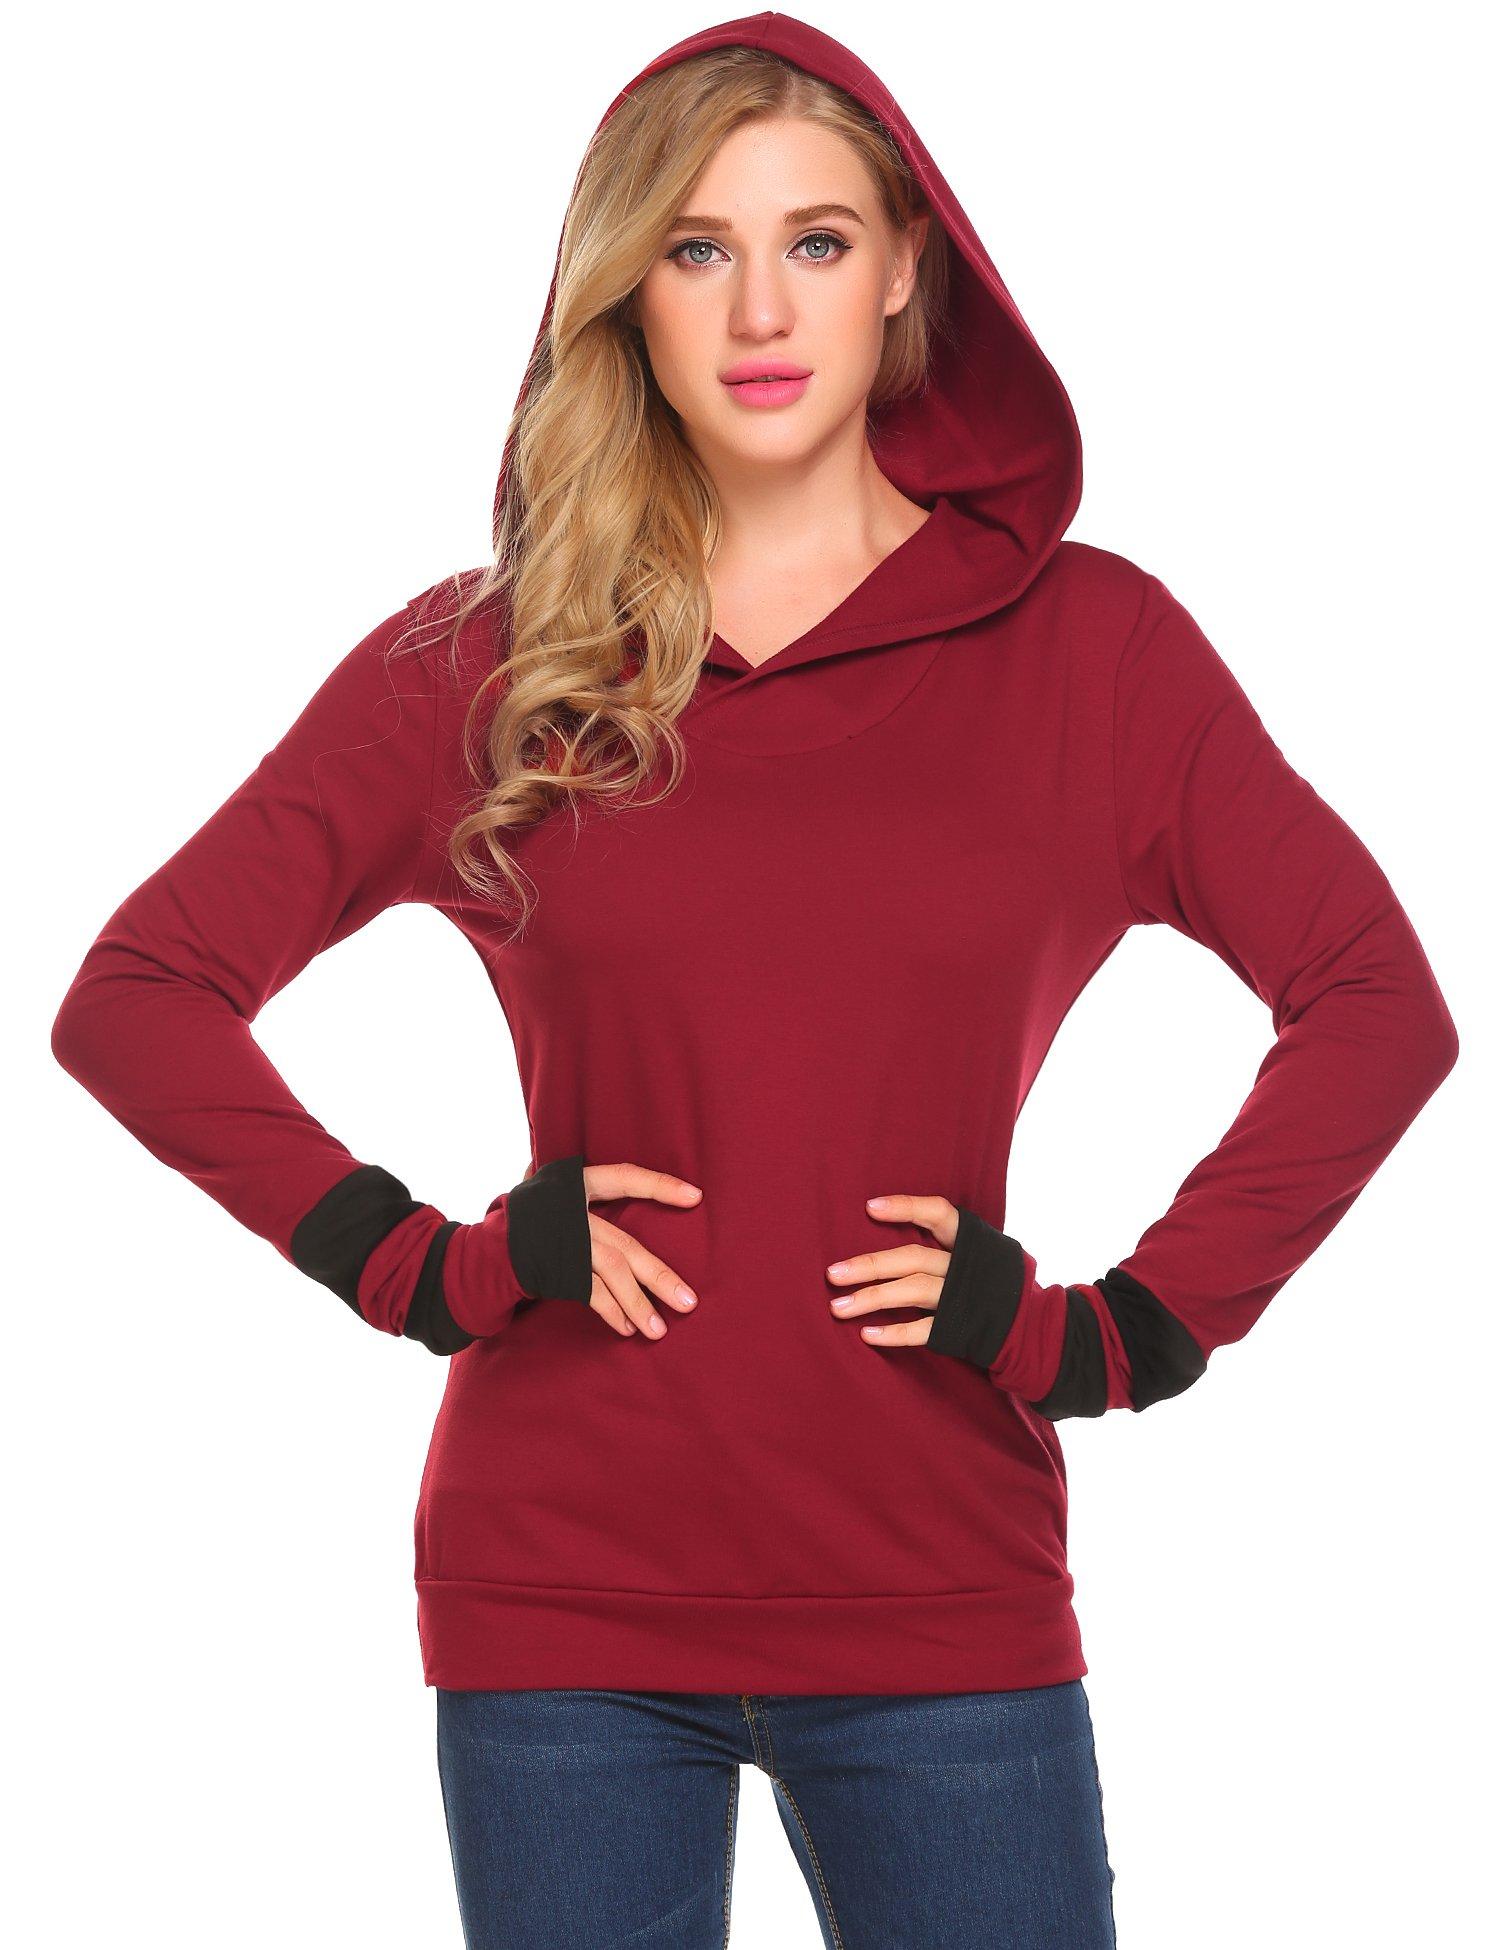 Zeagoo Women Fashion Color Block Hoodie Casual Shirt Top, Purple Red, Small